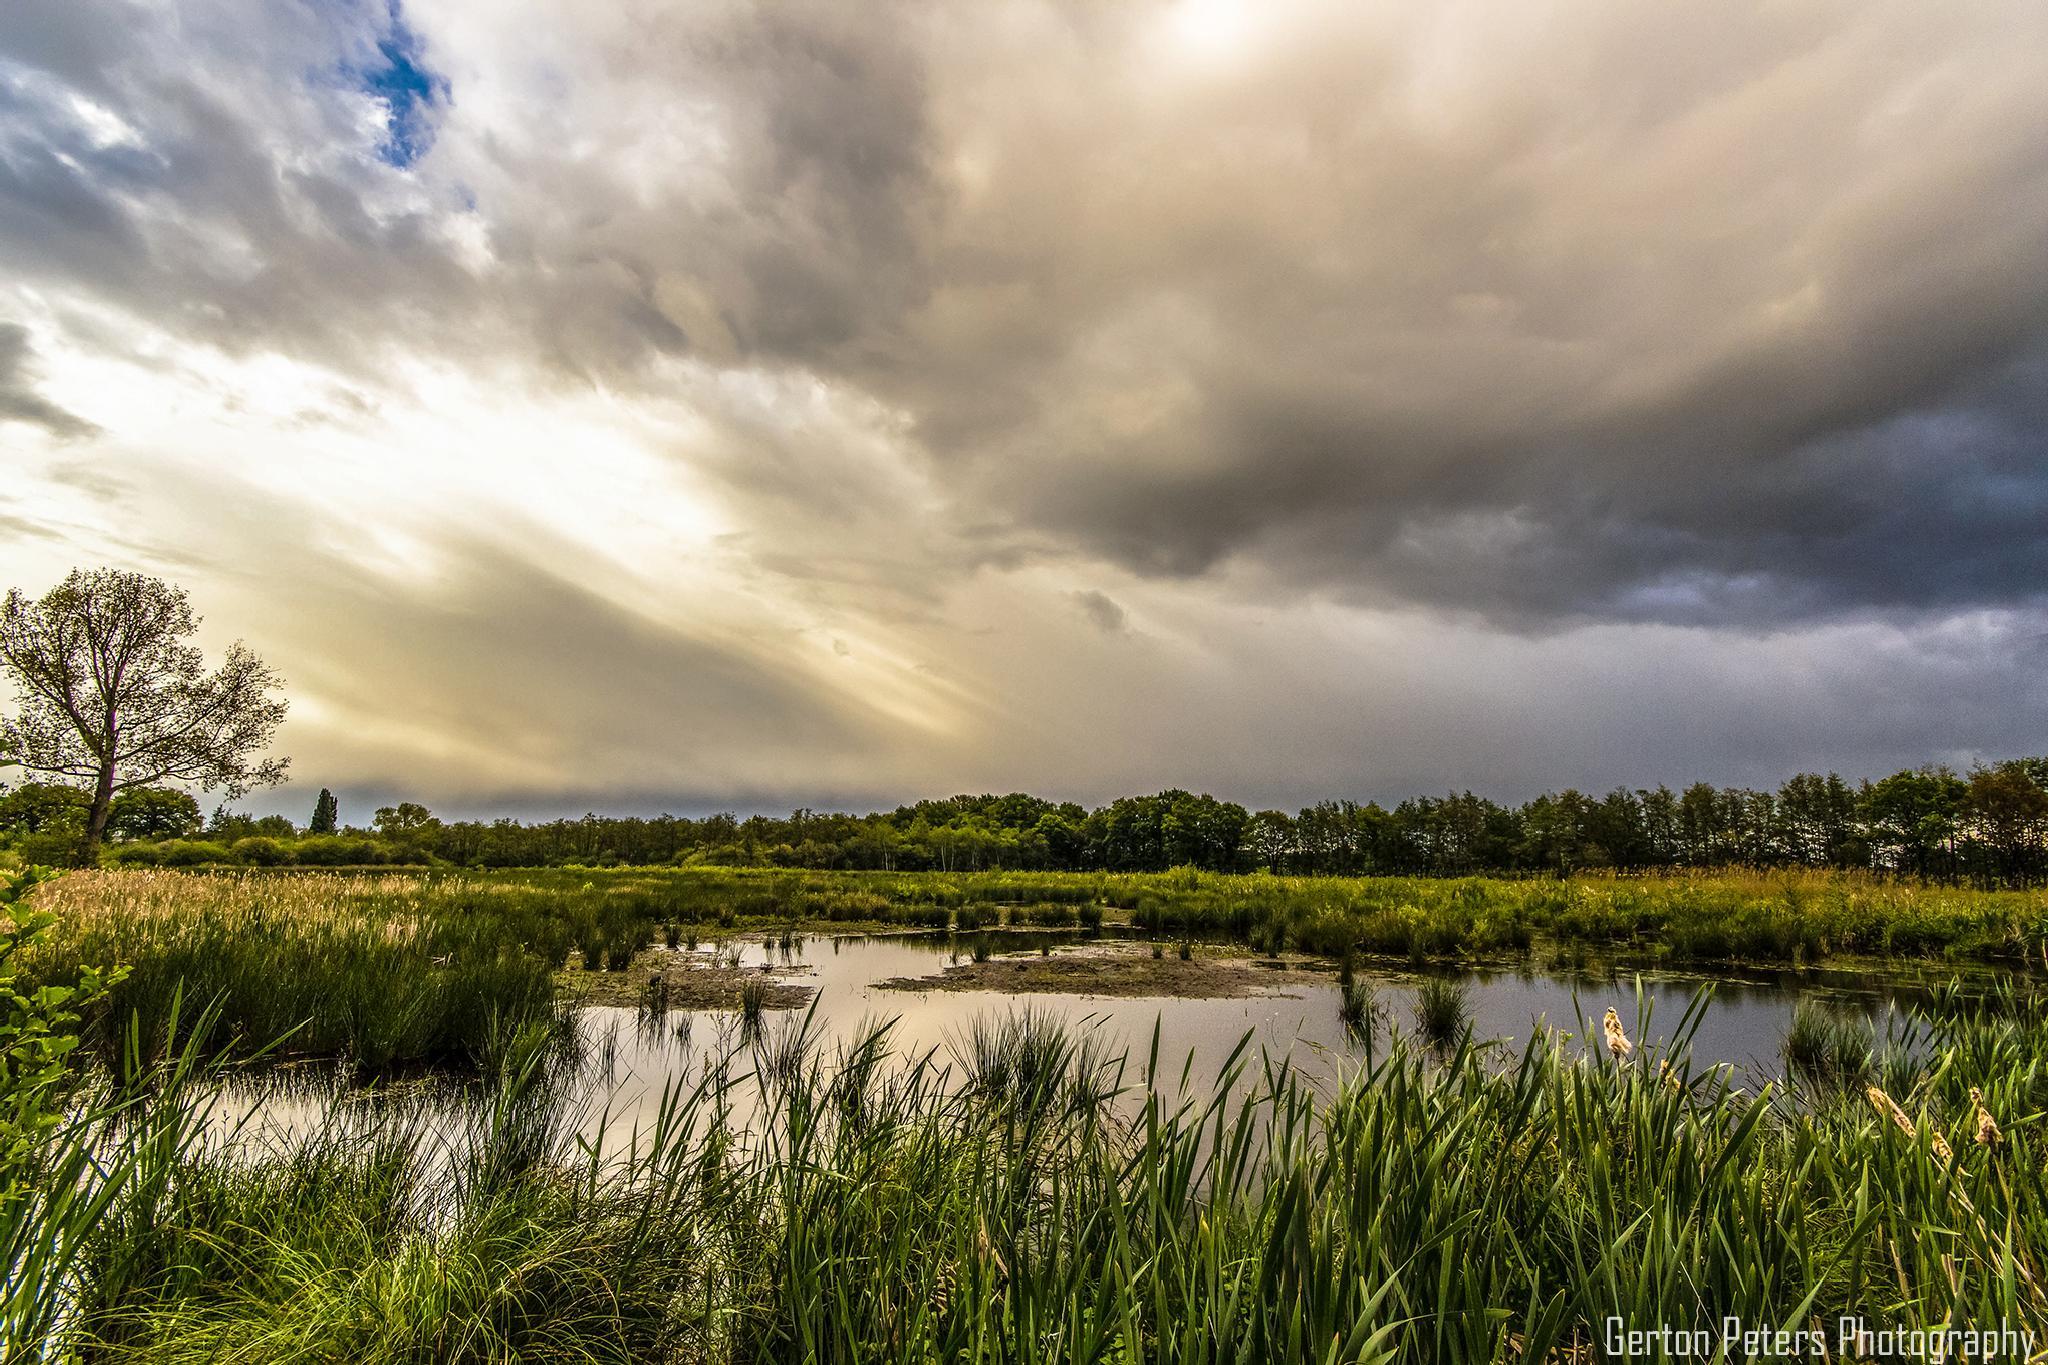 Rainy Sky by Gerton Peters